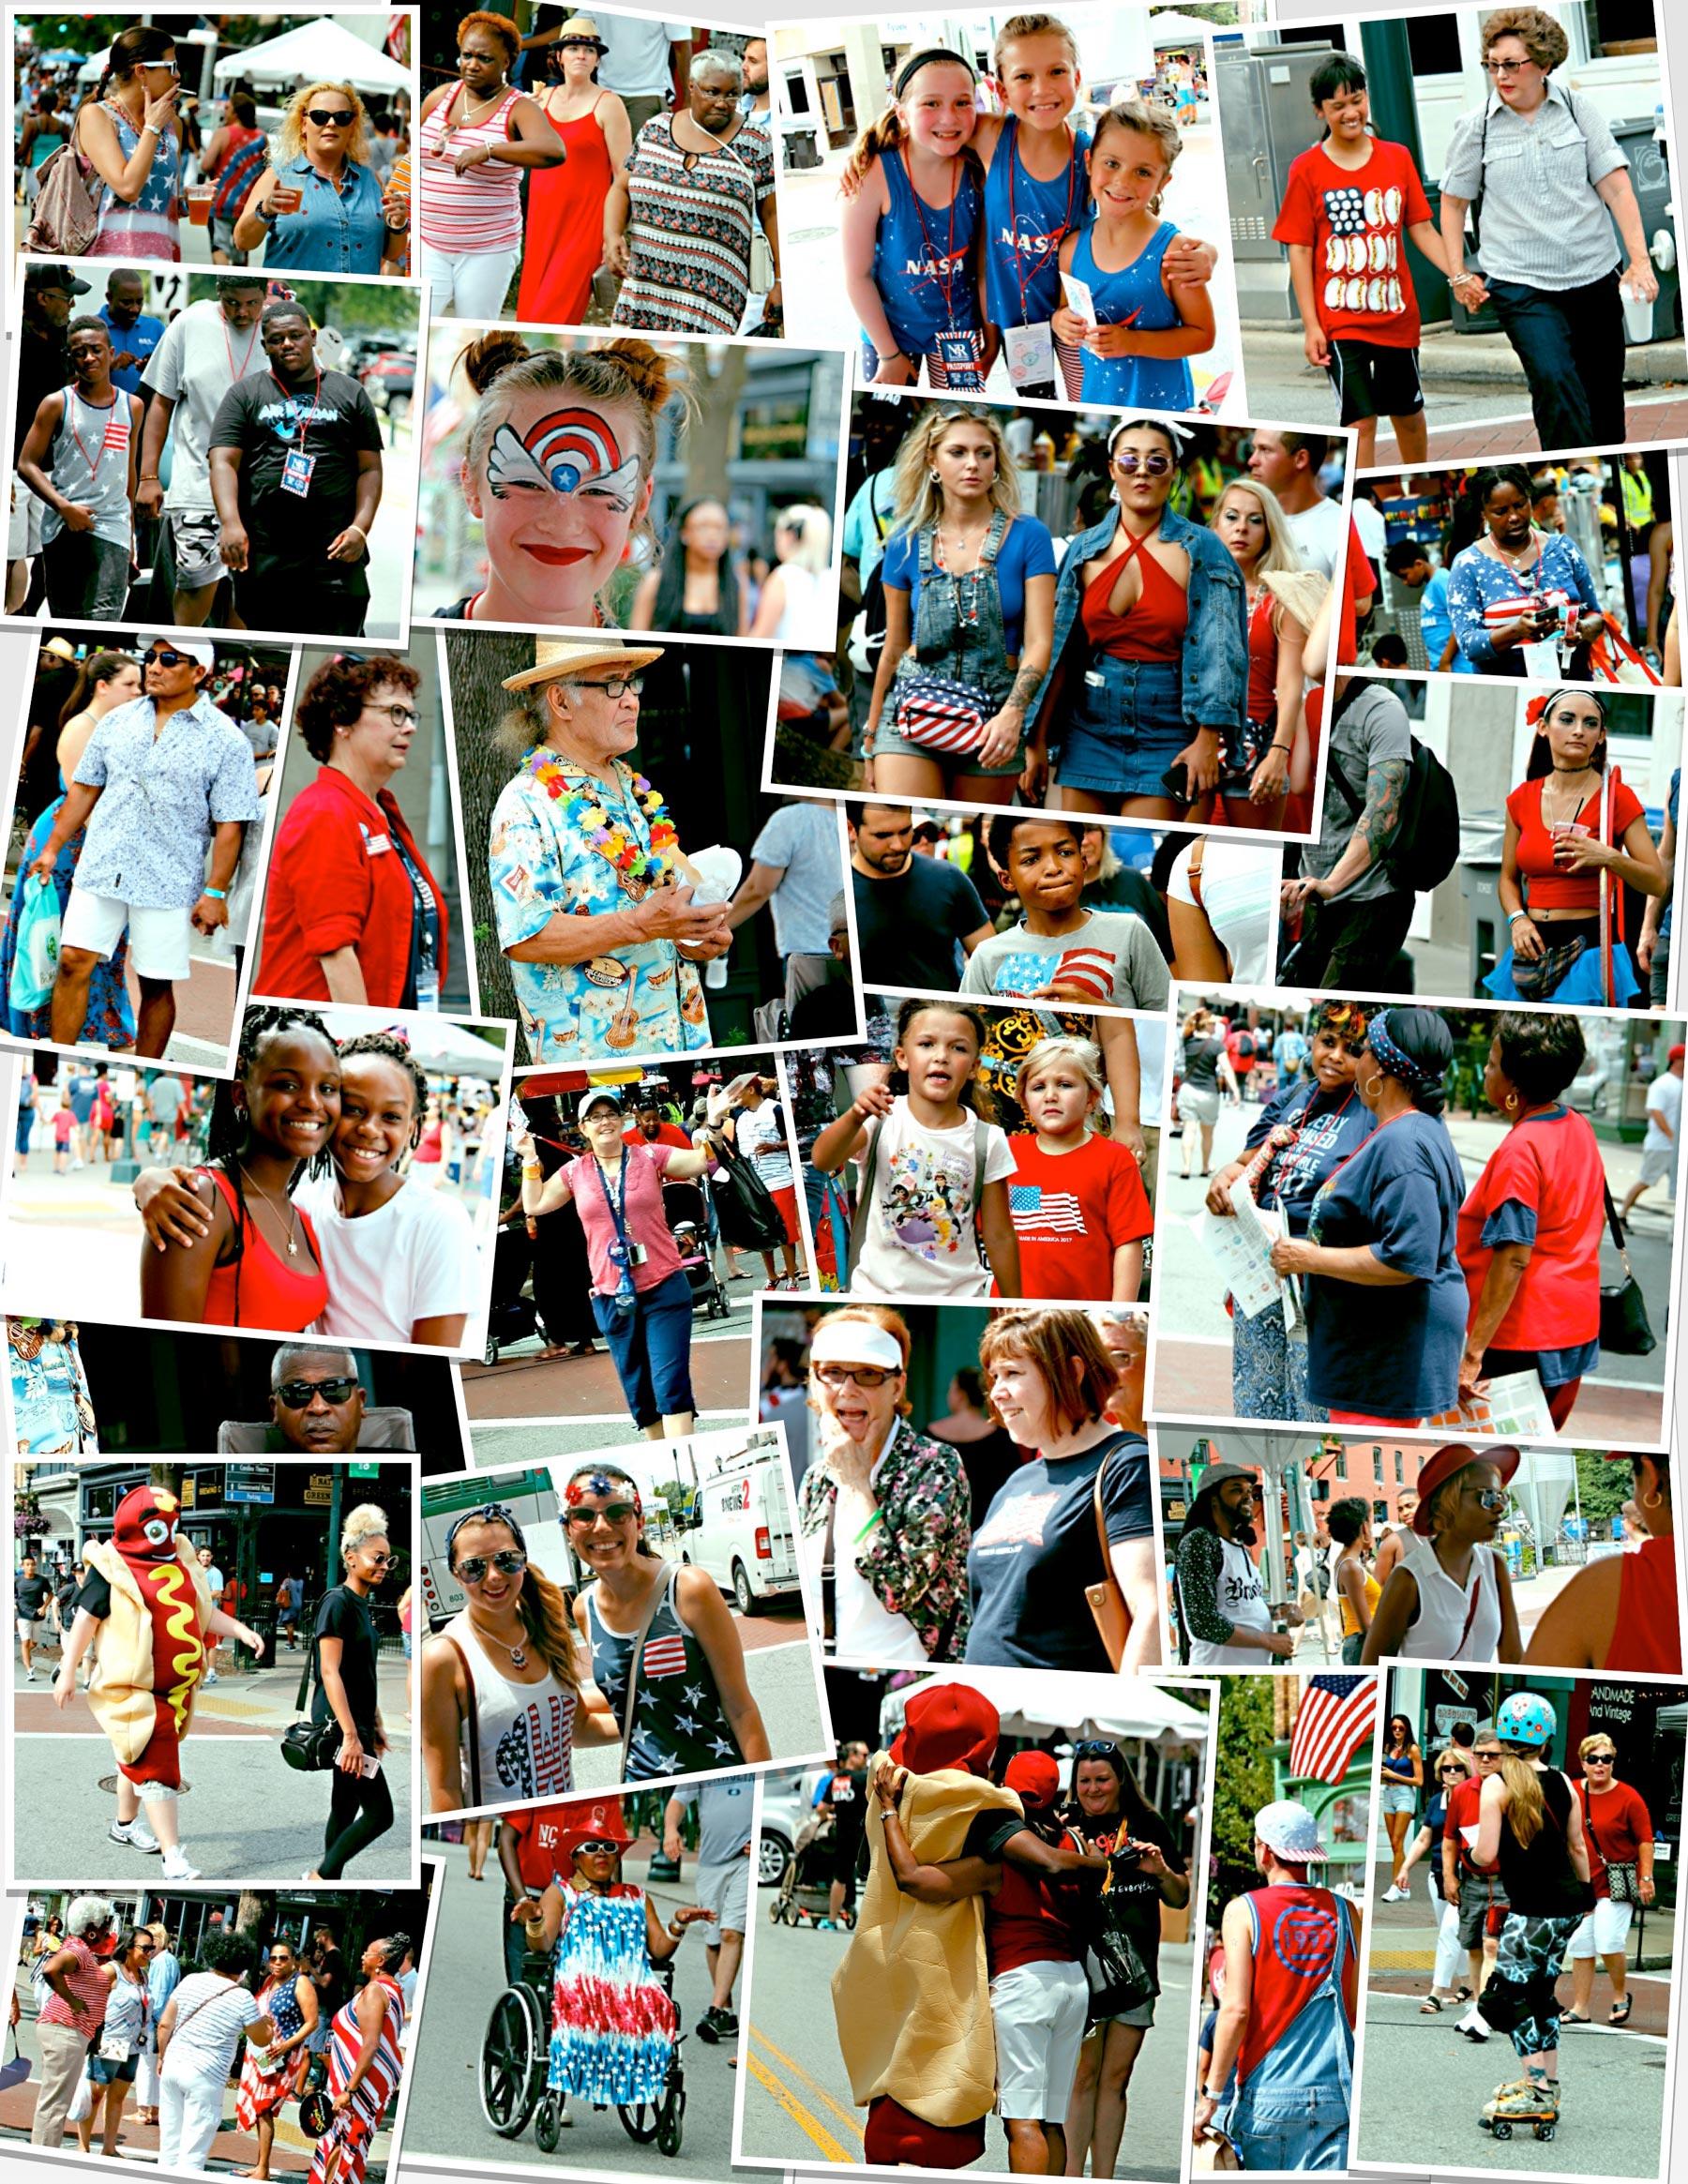 Greensboro-July-4-wonderful-community.jpg